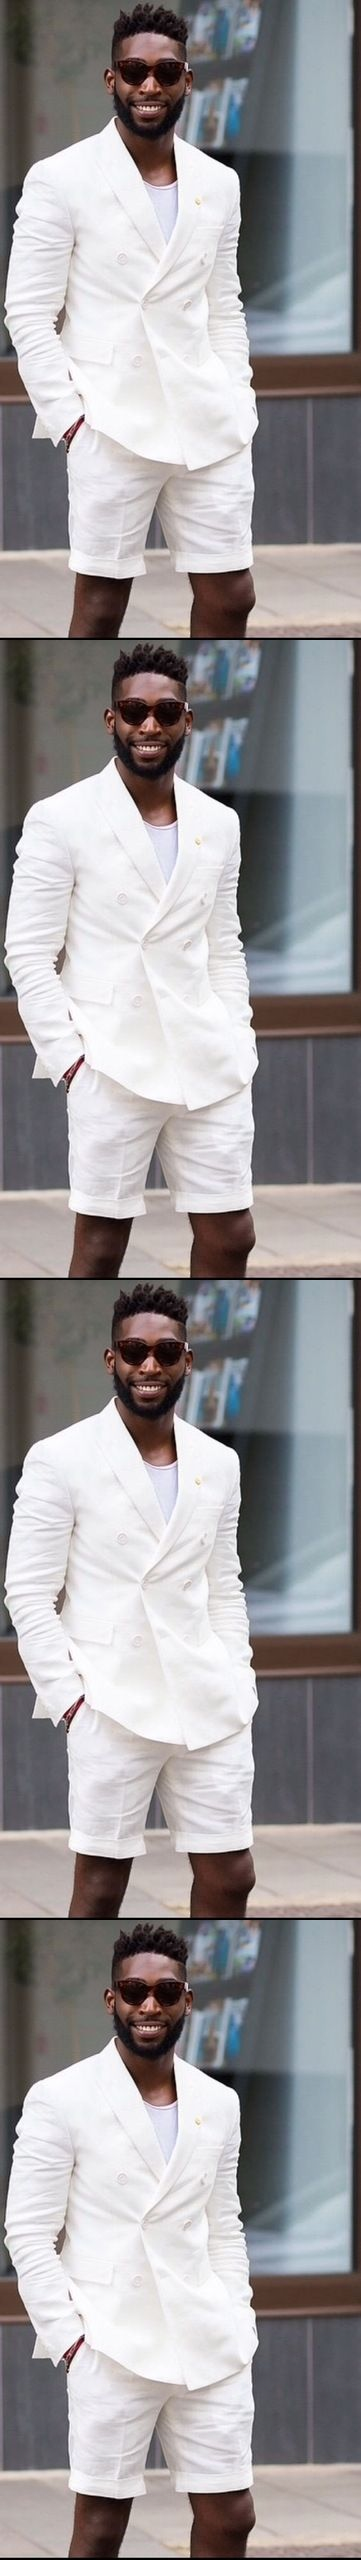 Short Pants Style Ivory White Men Suit Custom Slim Fit 2 Pieces Beach Wedding Party Tuxedo Terno Masculino 2017 (Jacket+Pants)